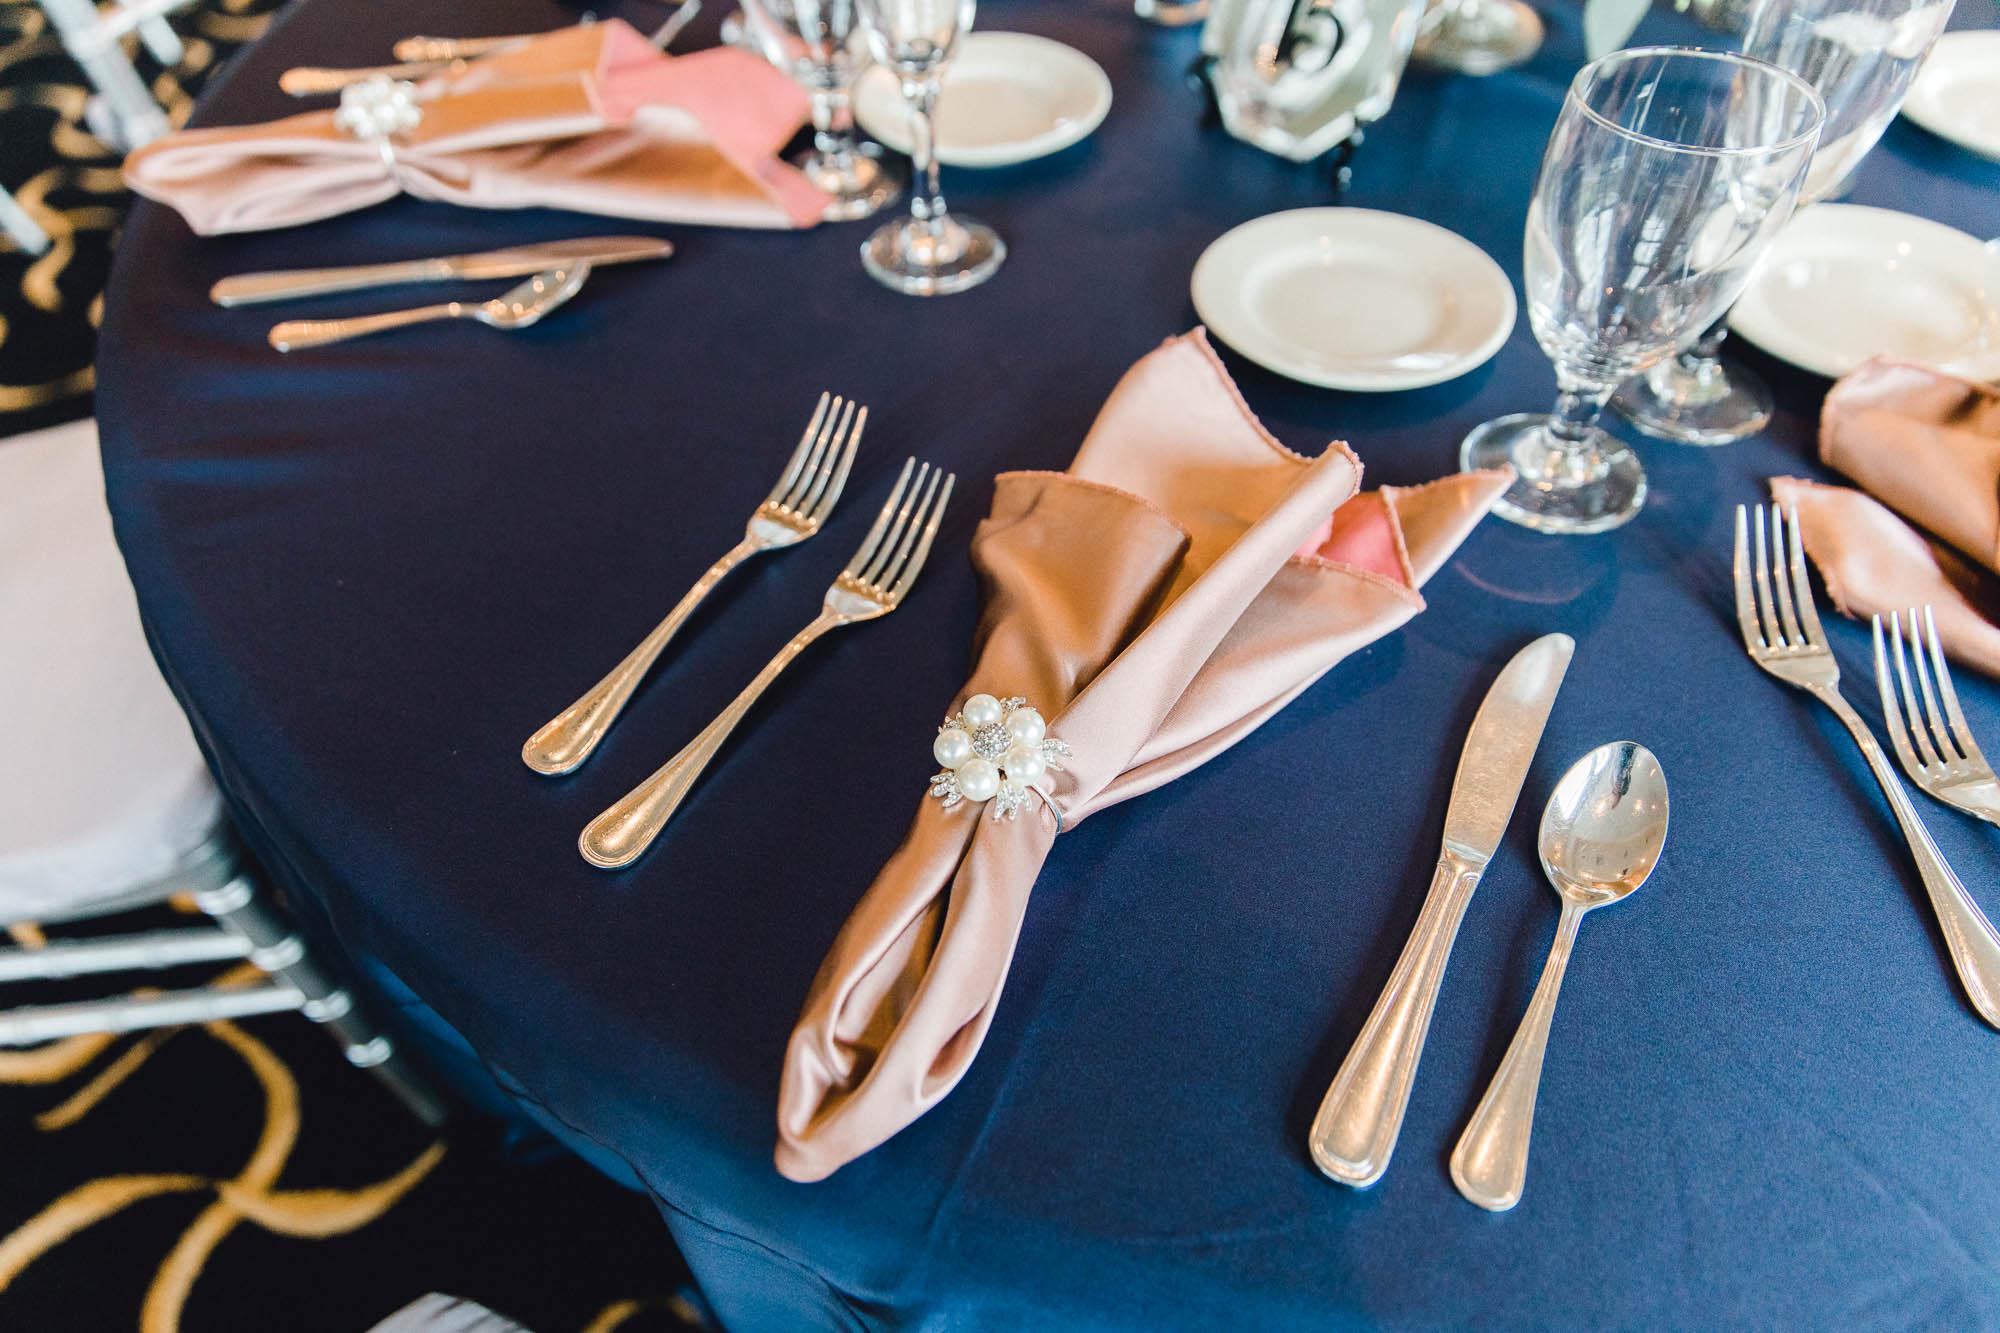 stonhedge-country-club-wedding-7921.jpg